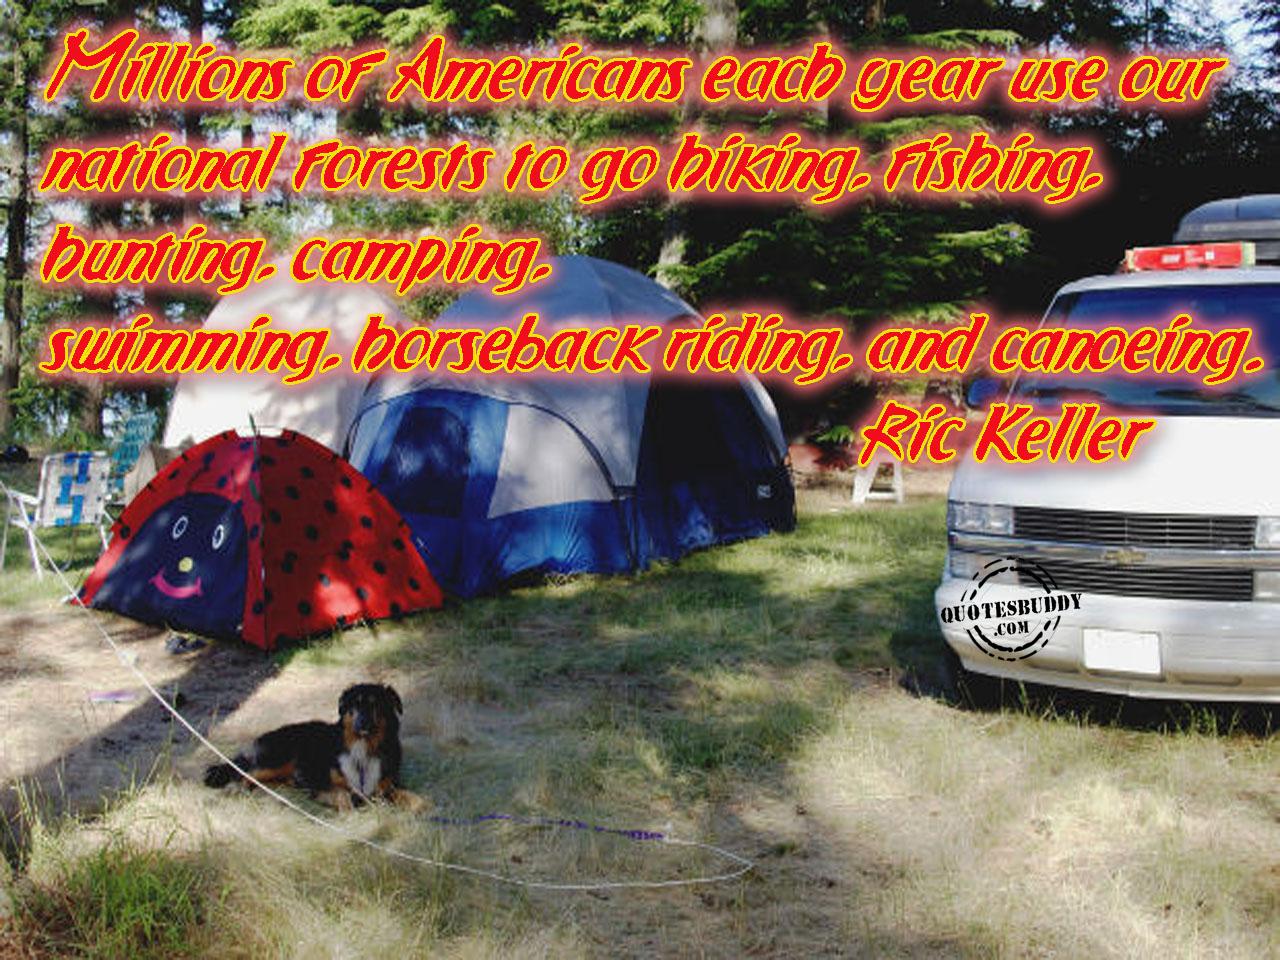 Ric Keller's quote #2